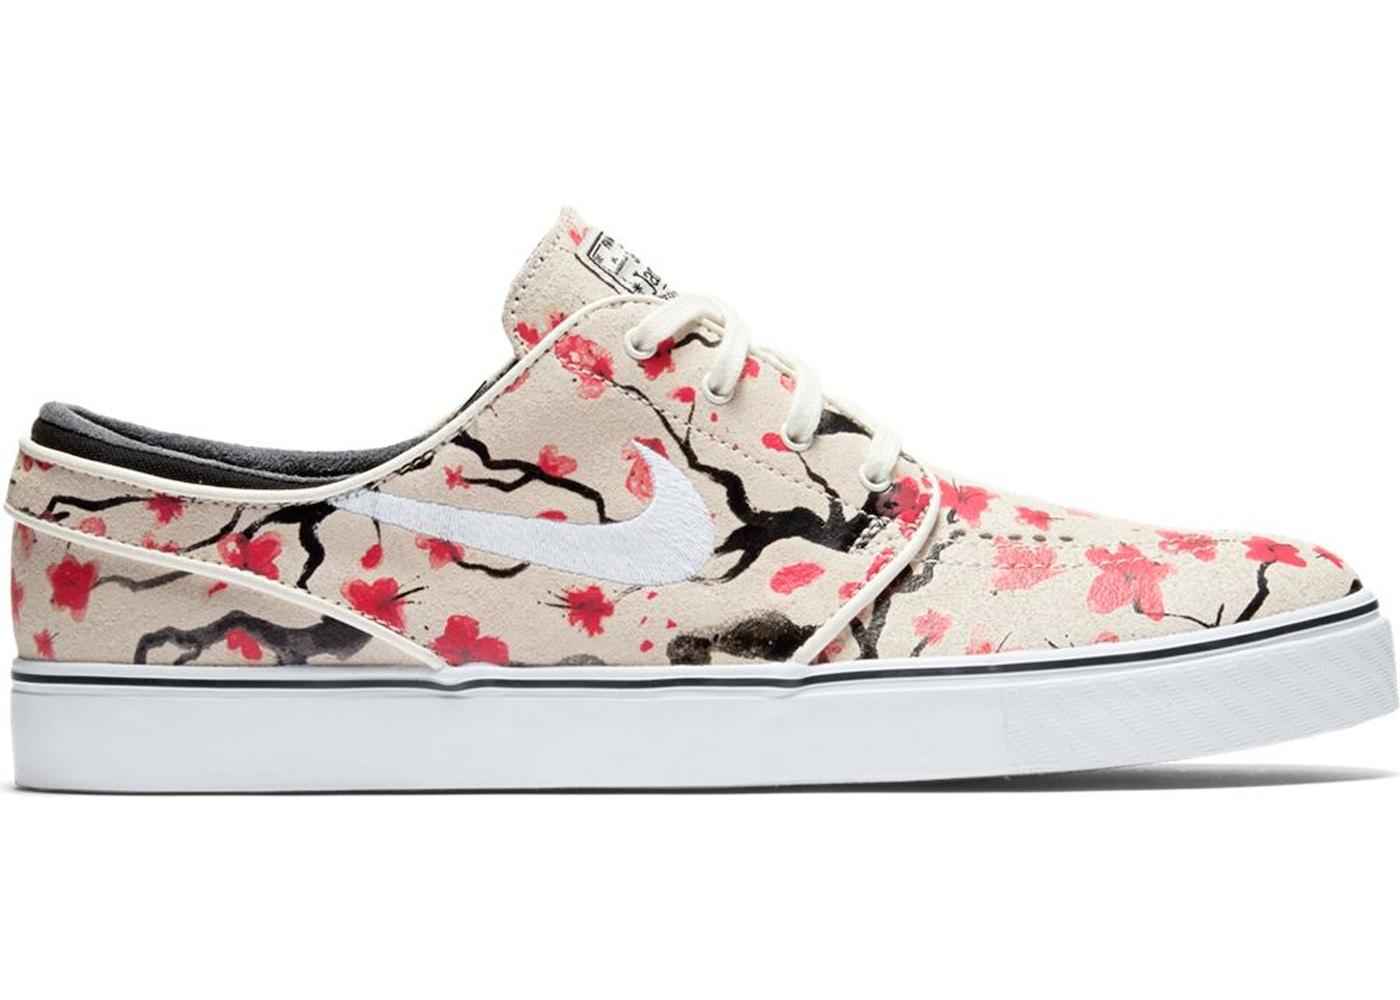 52f05a05d Nike SB Zoom Stefan Janoski Cherry Blossom